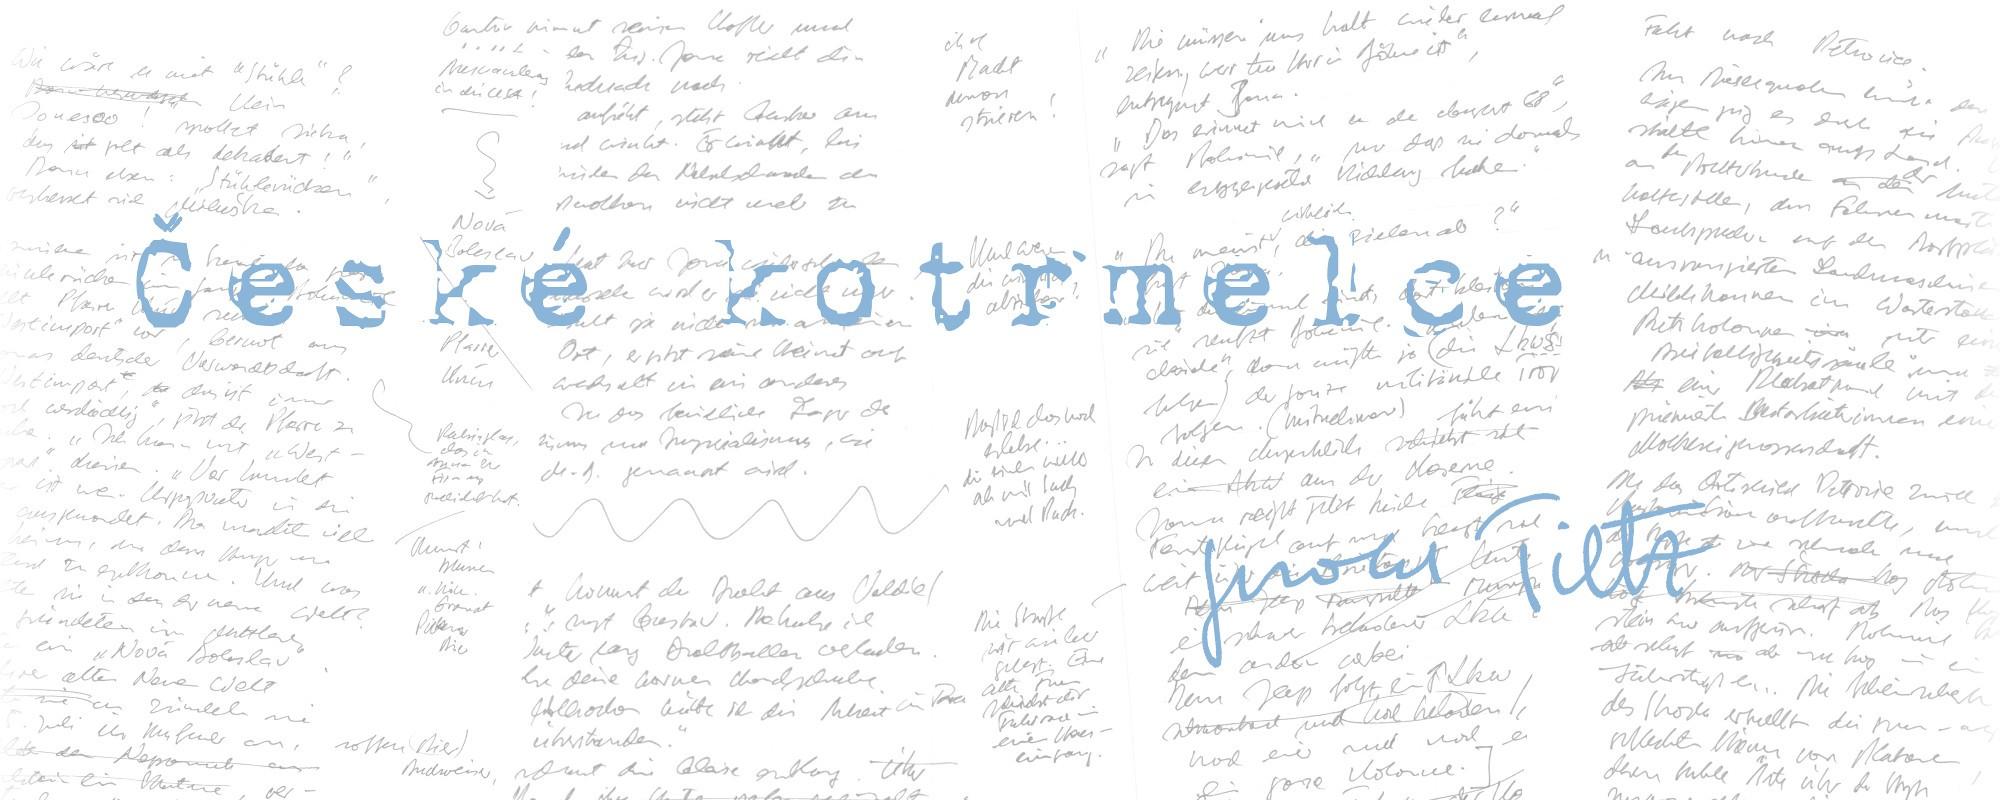 Gerold-Tietz-Ceske-Kotrmelce-Schriftbild